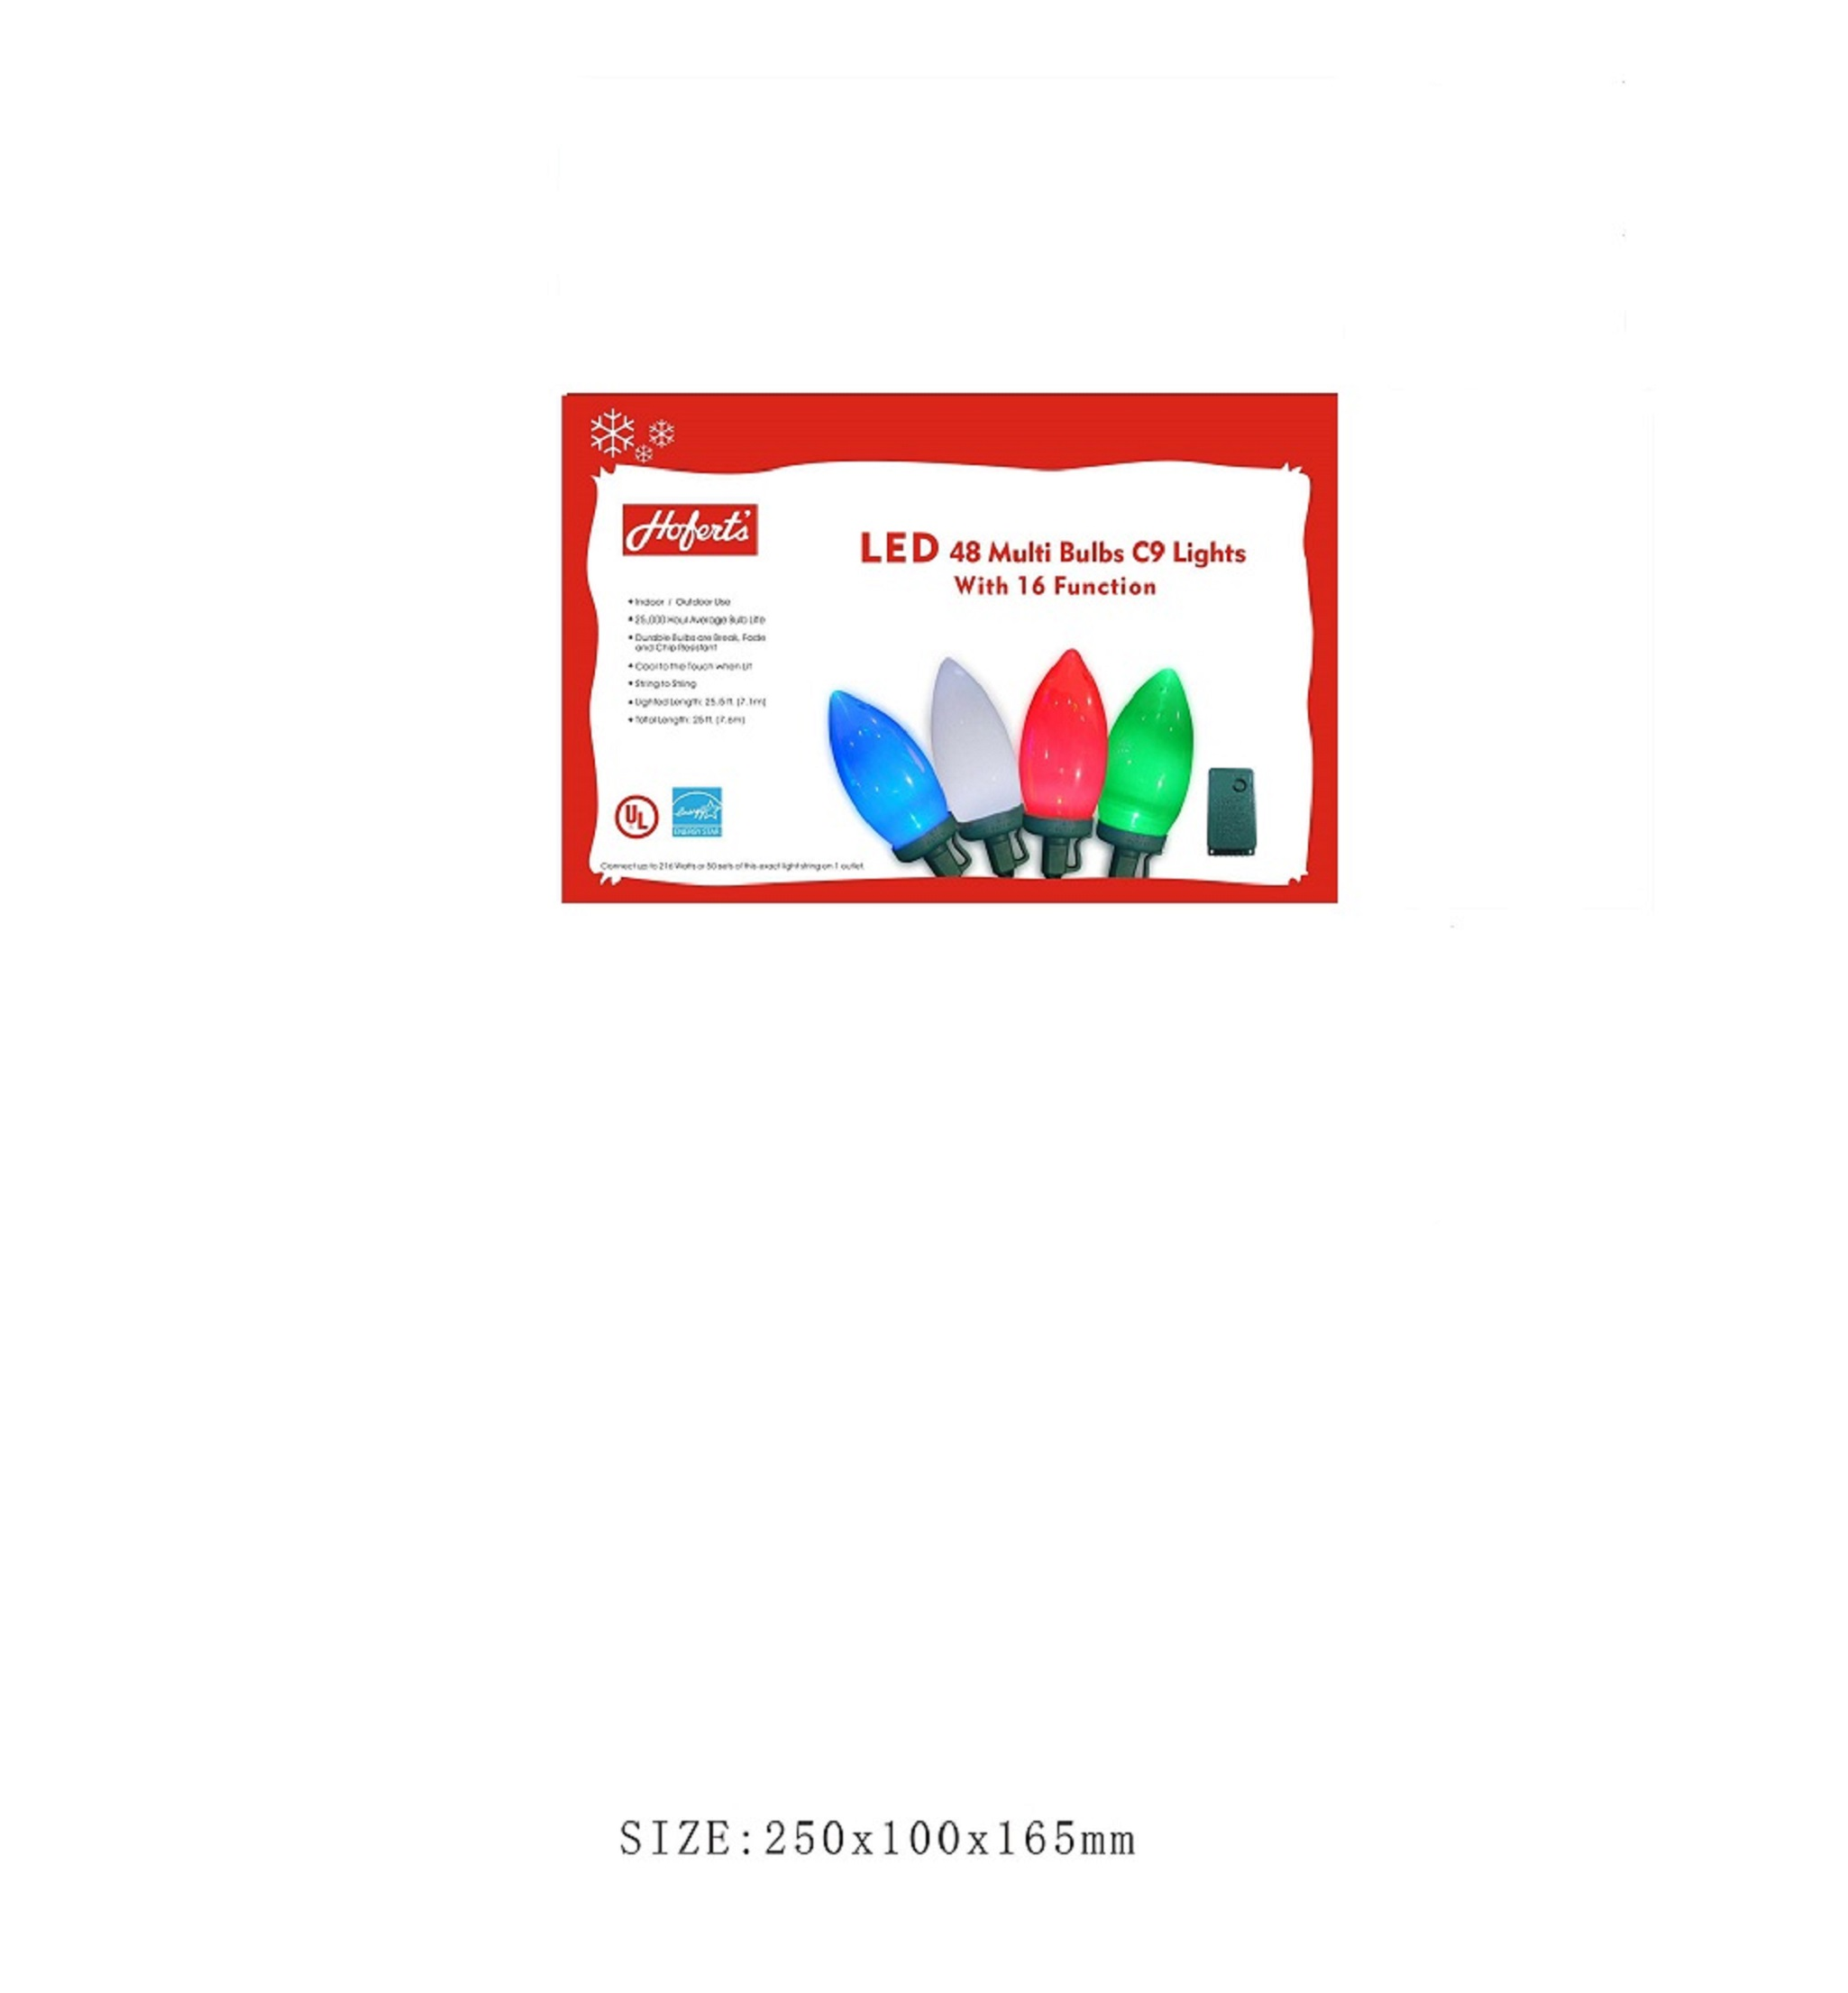 C9 Multi Colored - 48 Lights - Multi Function - LED